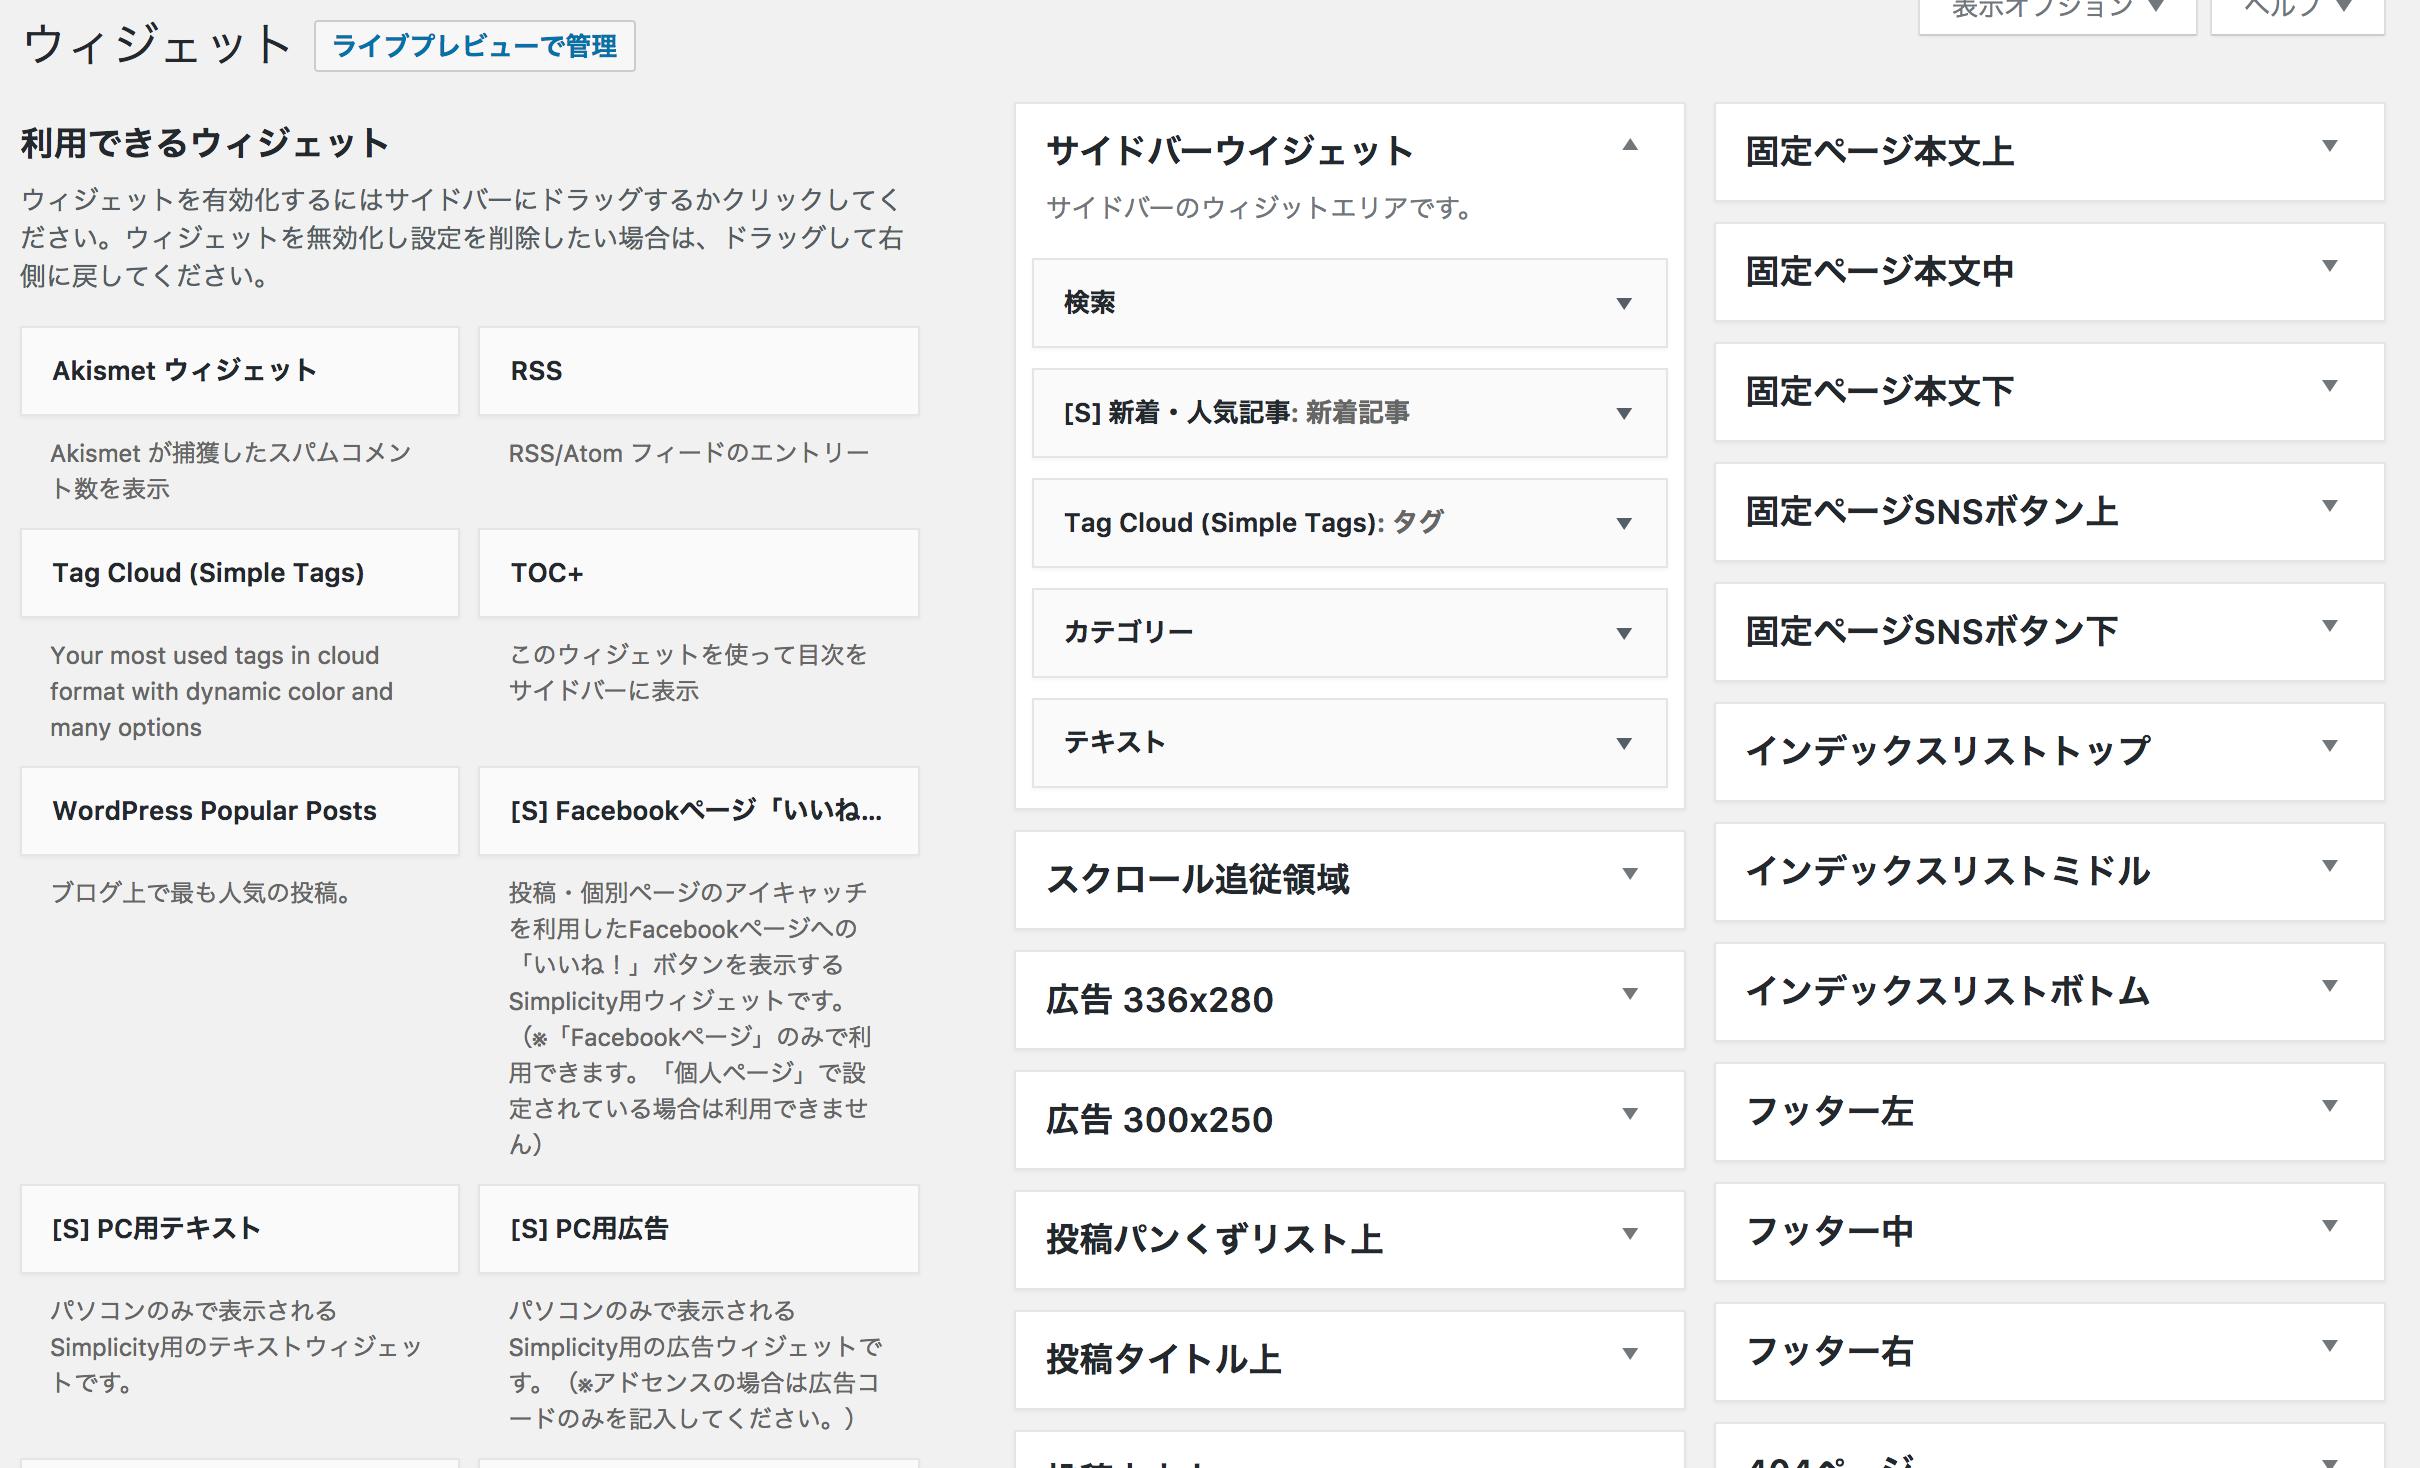 739c234f23a133c3ae222f9207f46501 - WordPressの「外観」「テーマ」「テンプレート」に関する基本操作